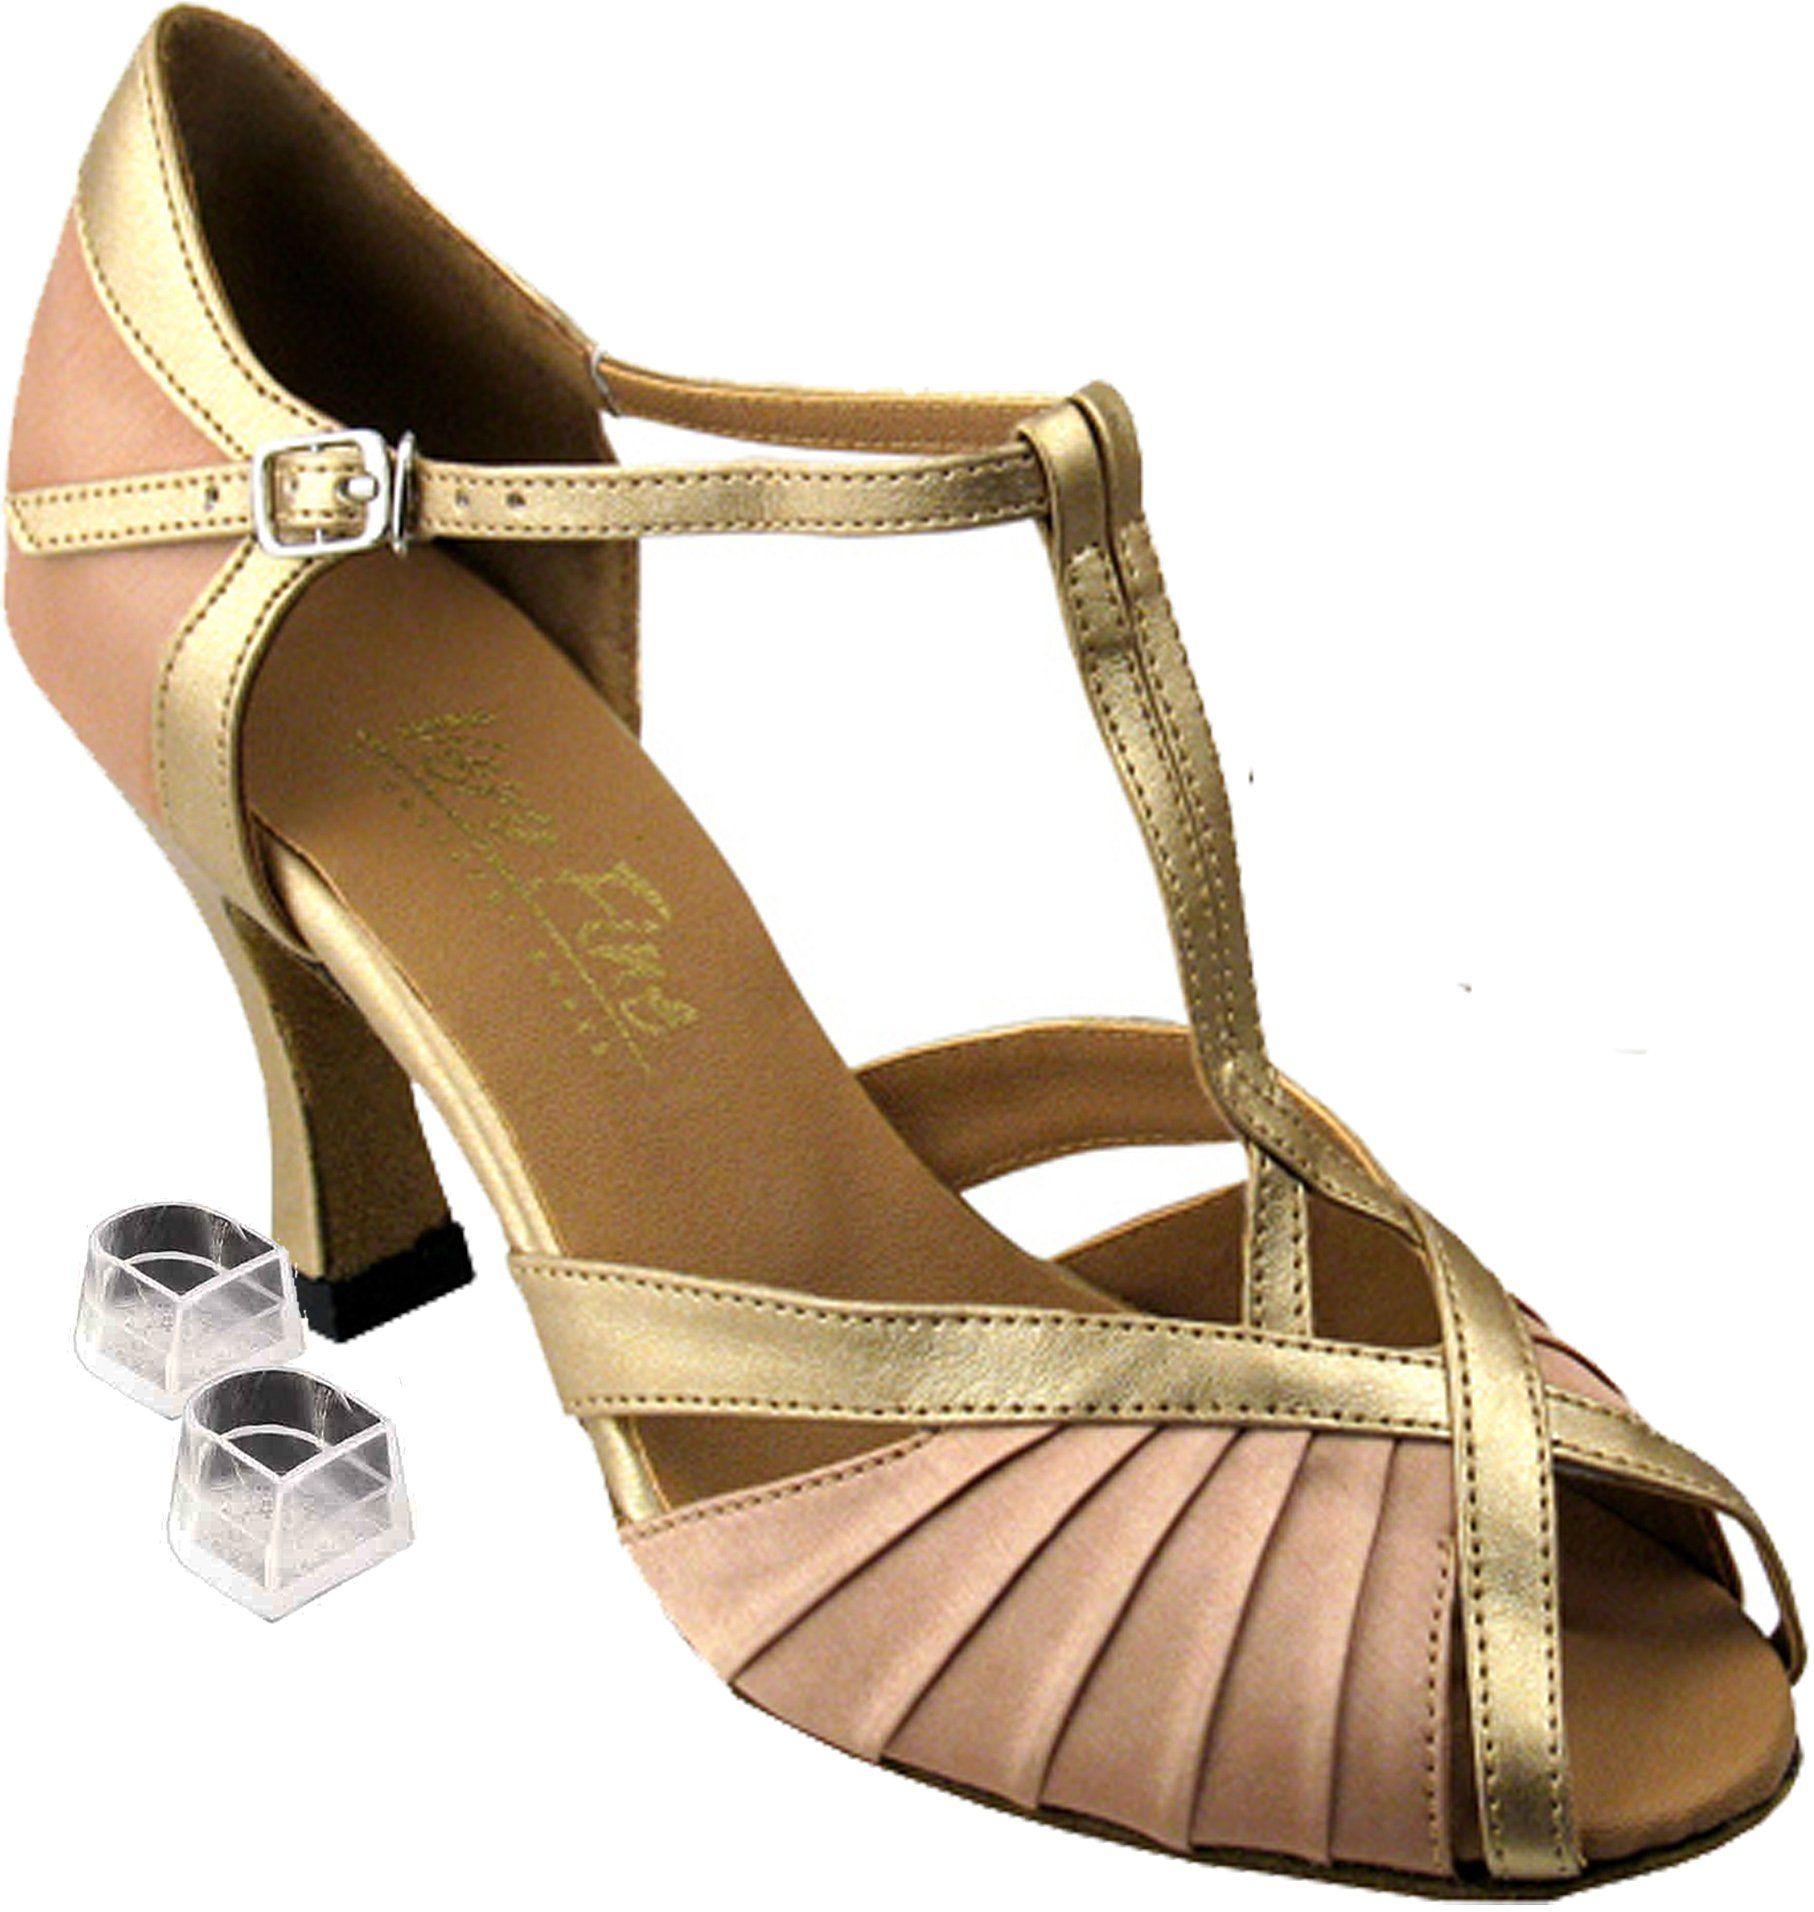 5e45772d84d5b Amazon.com: Very Fine Women's Salsa Ballroom Tango Latin Dance Shoes ...